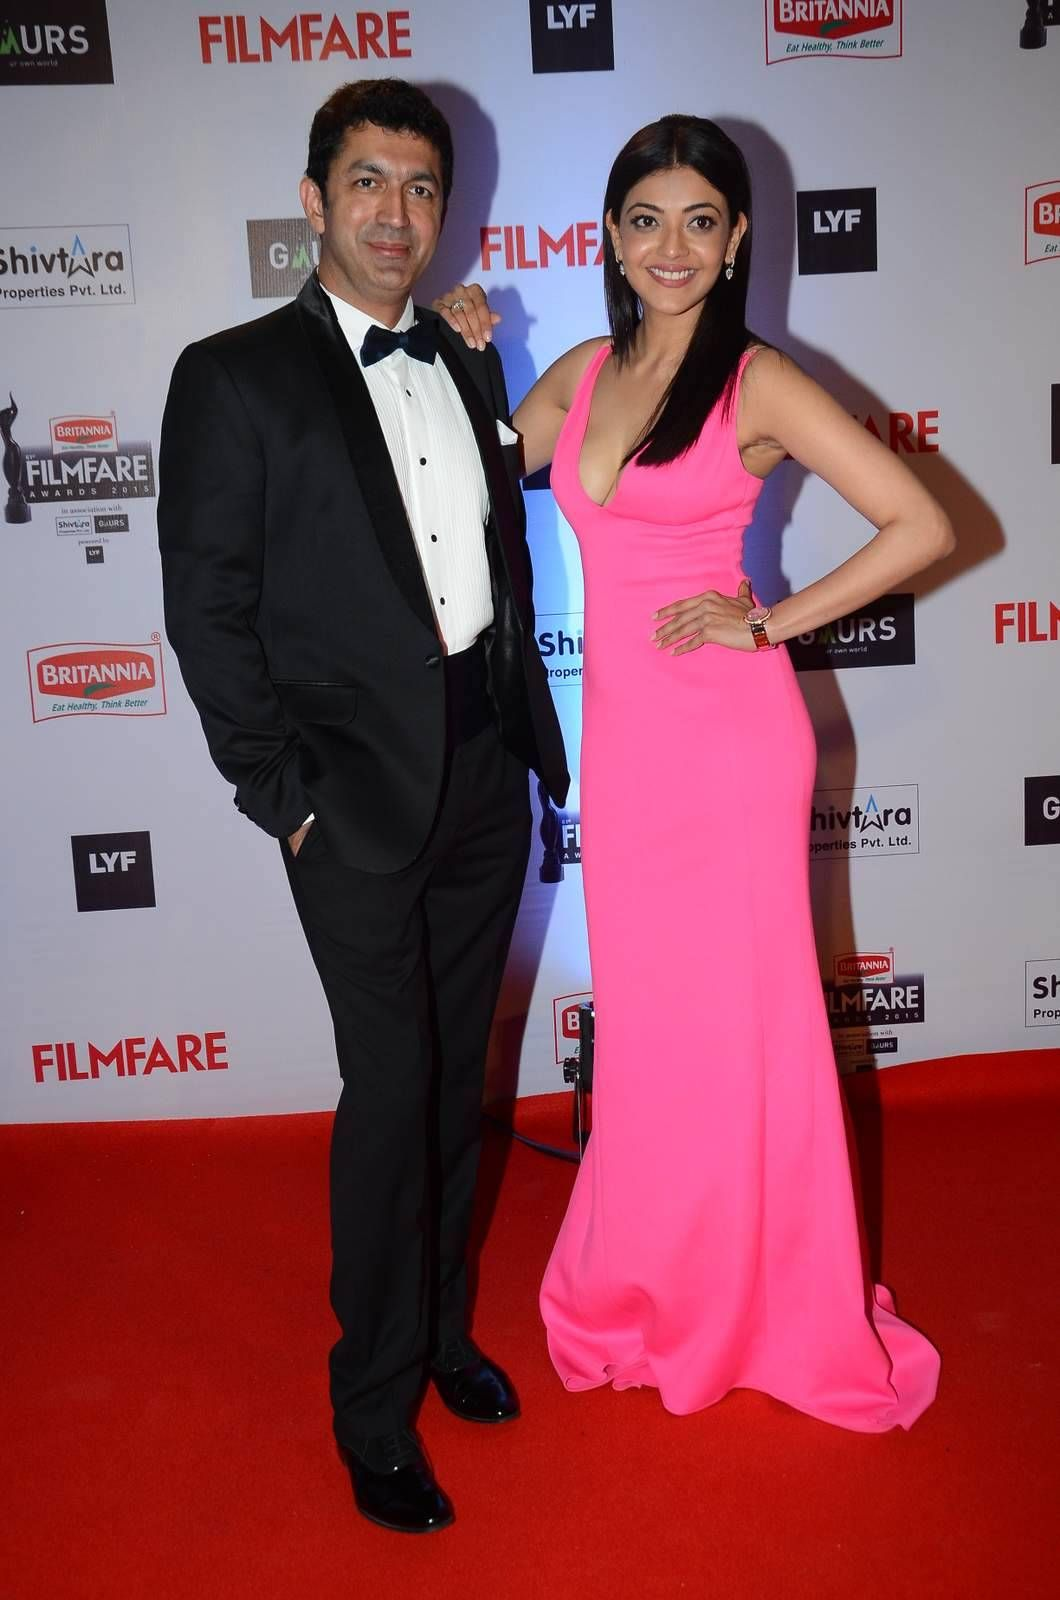 Kajal Agarwal Filmfare Awards 2016 Red Carpet (2) | Actresses | Red